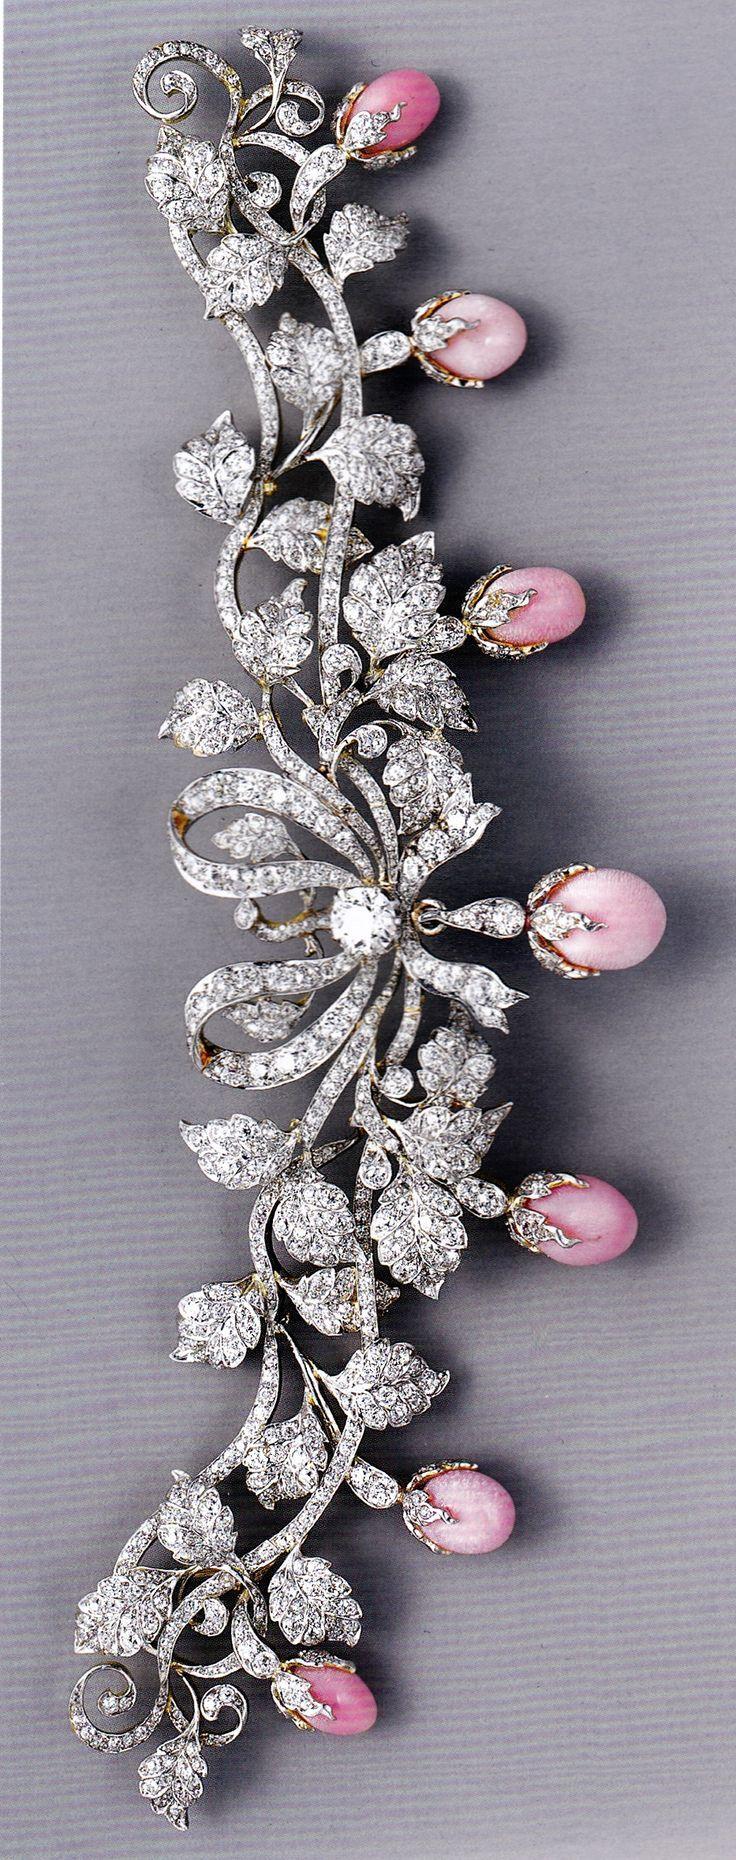 An antique bodice ornament, bu Tiffany & Co., circa 1890-95. Composed of platinu...